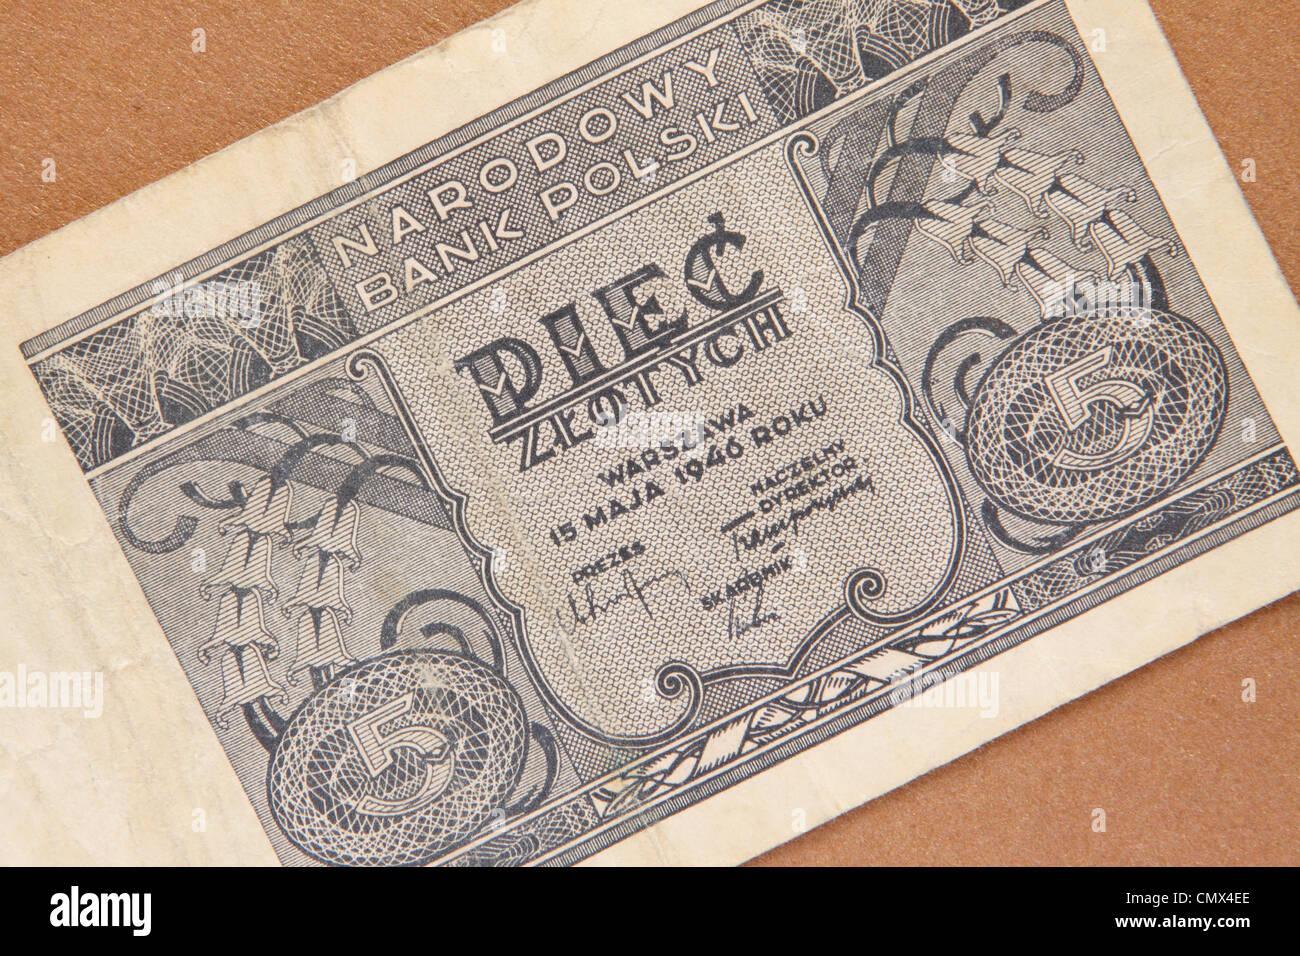 Pologne Polish zloty 5 Billets en date du 1946 délivré par le Narodowy Bank Polski juste après WW2 Photo Stock